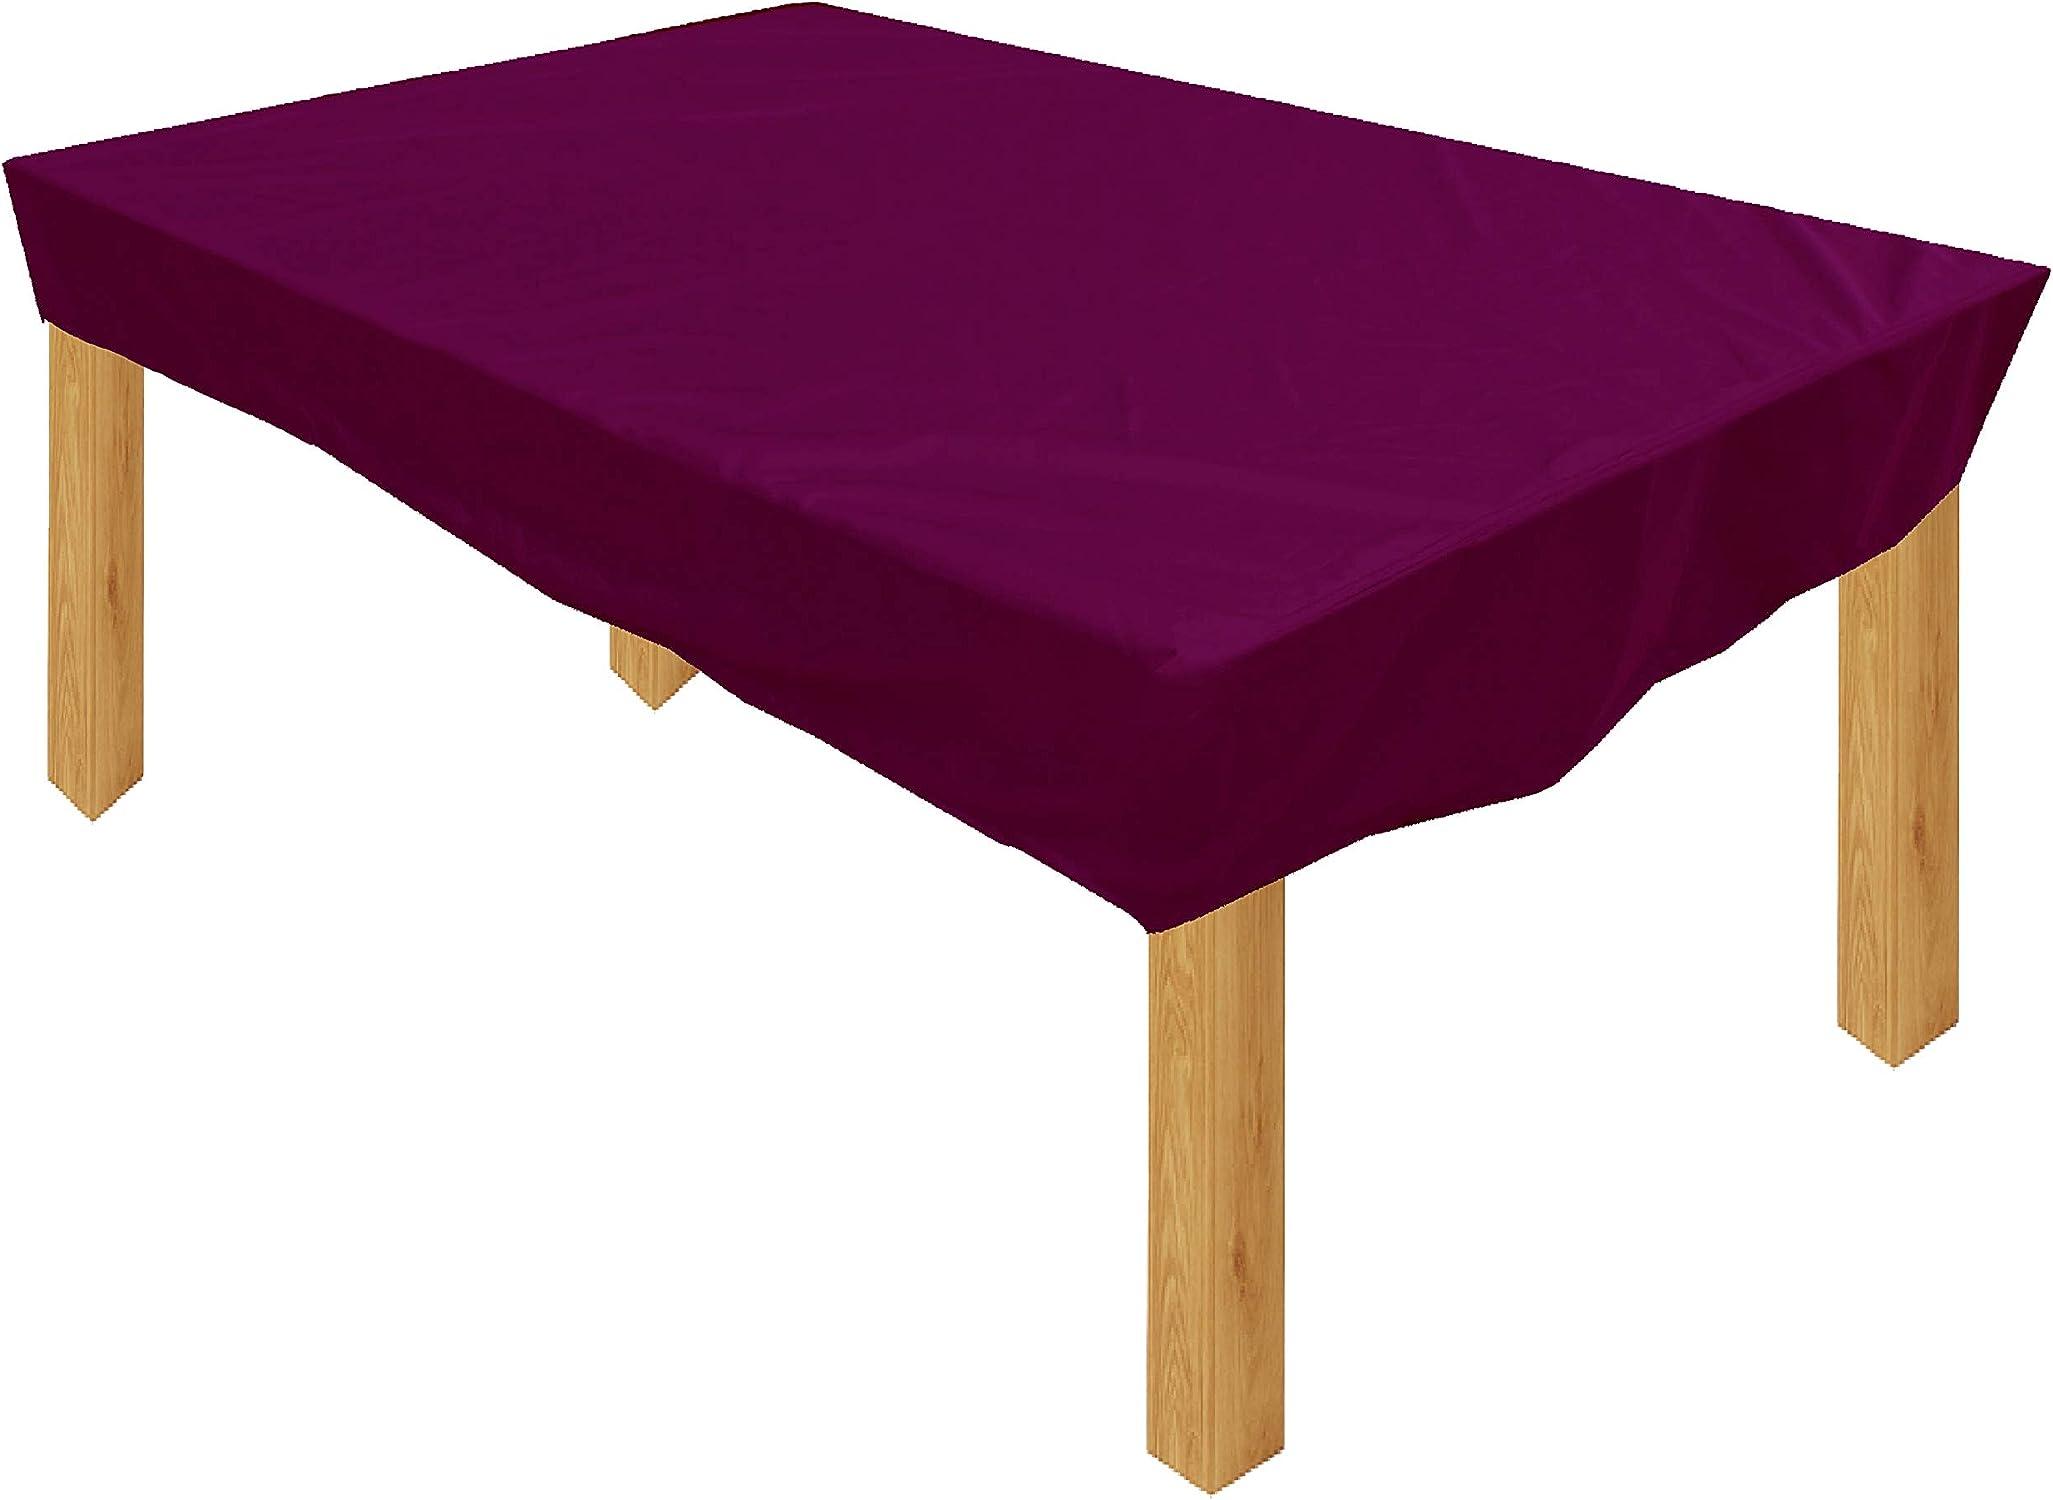 oferta de tienda KaufPirat Premium Funda para Muebles de Jardín 320x90x15 cm cm cm Cubierta Impermeable Funda para Mesa para Mobiliario de Exterior Burdeos  moda clasica